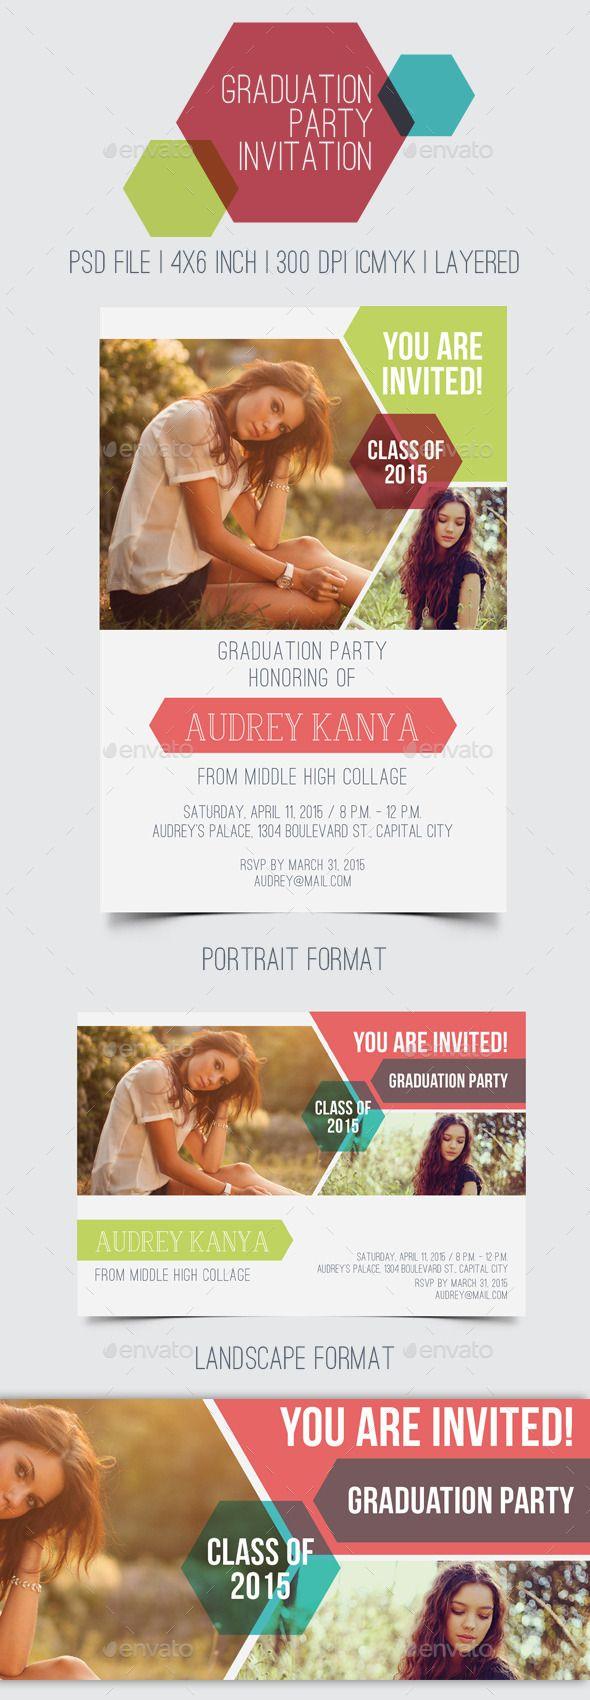 Graduation Party Invitation Template PSD 20 best